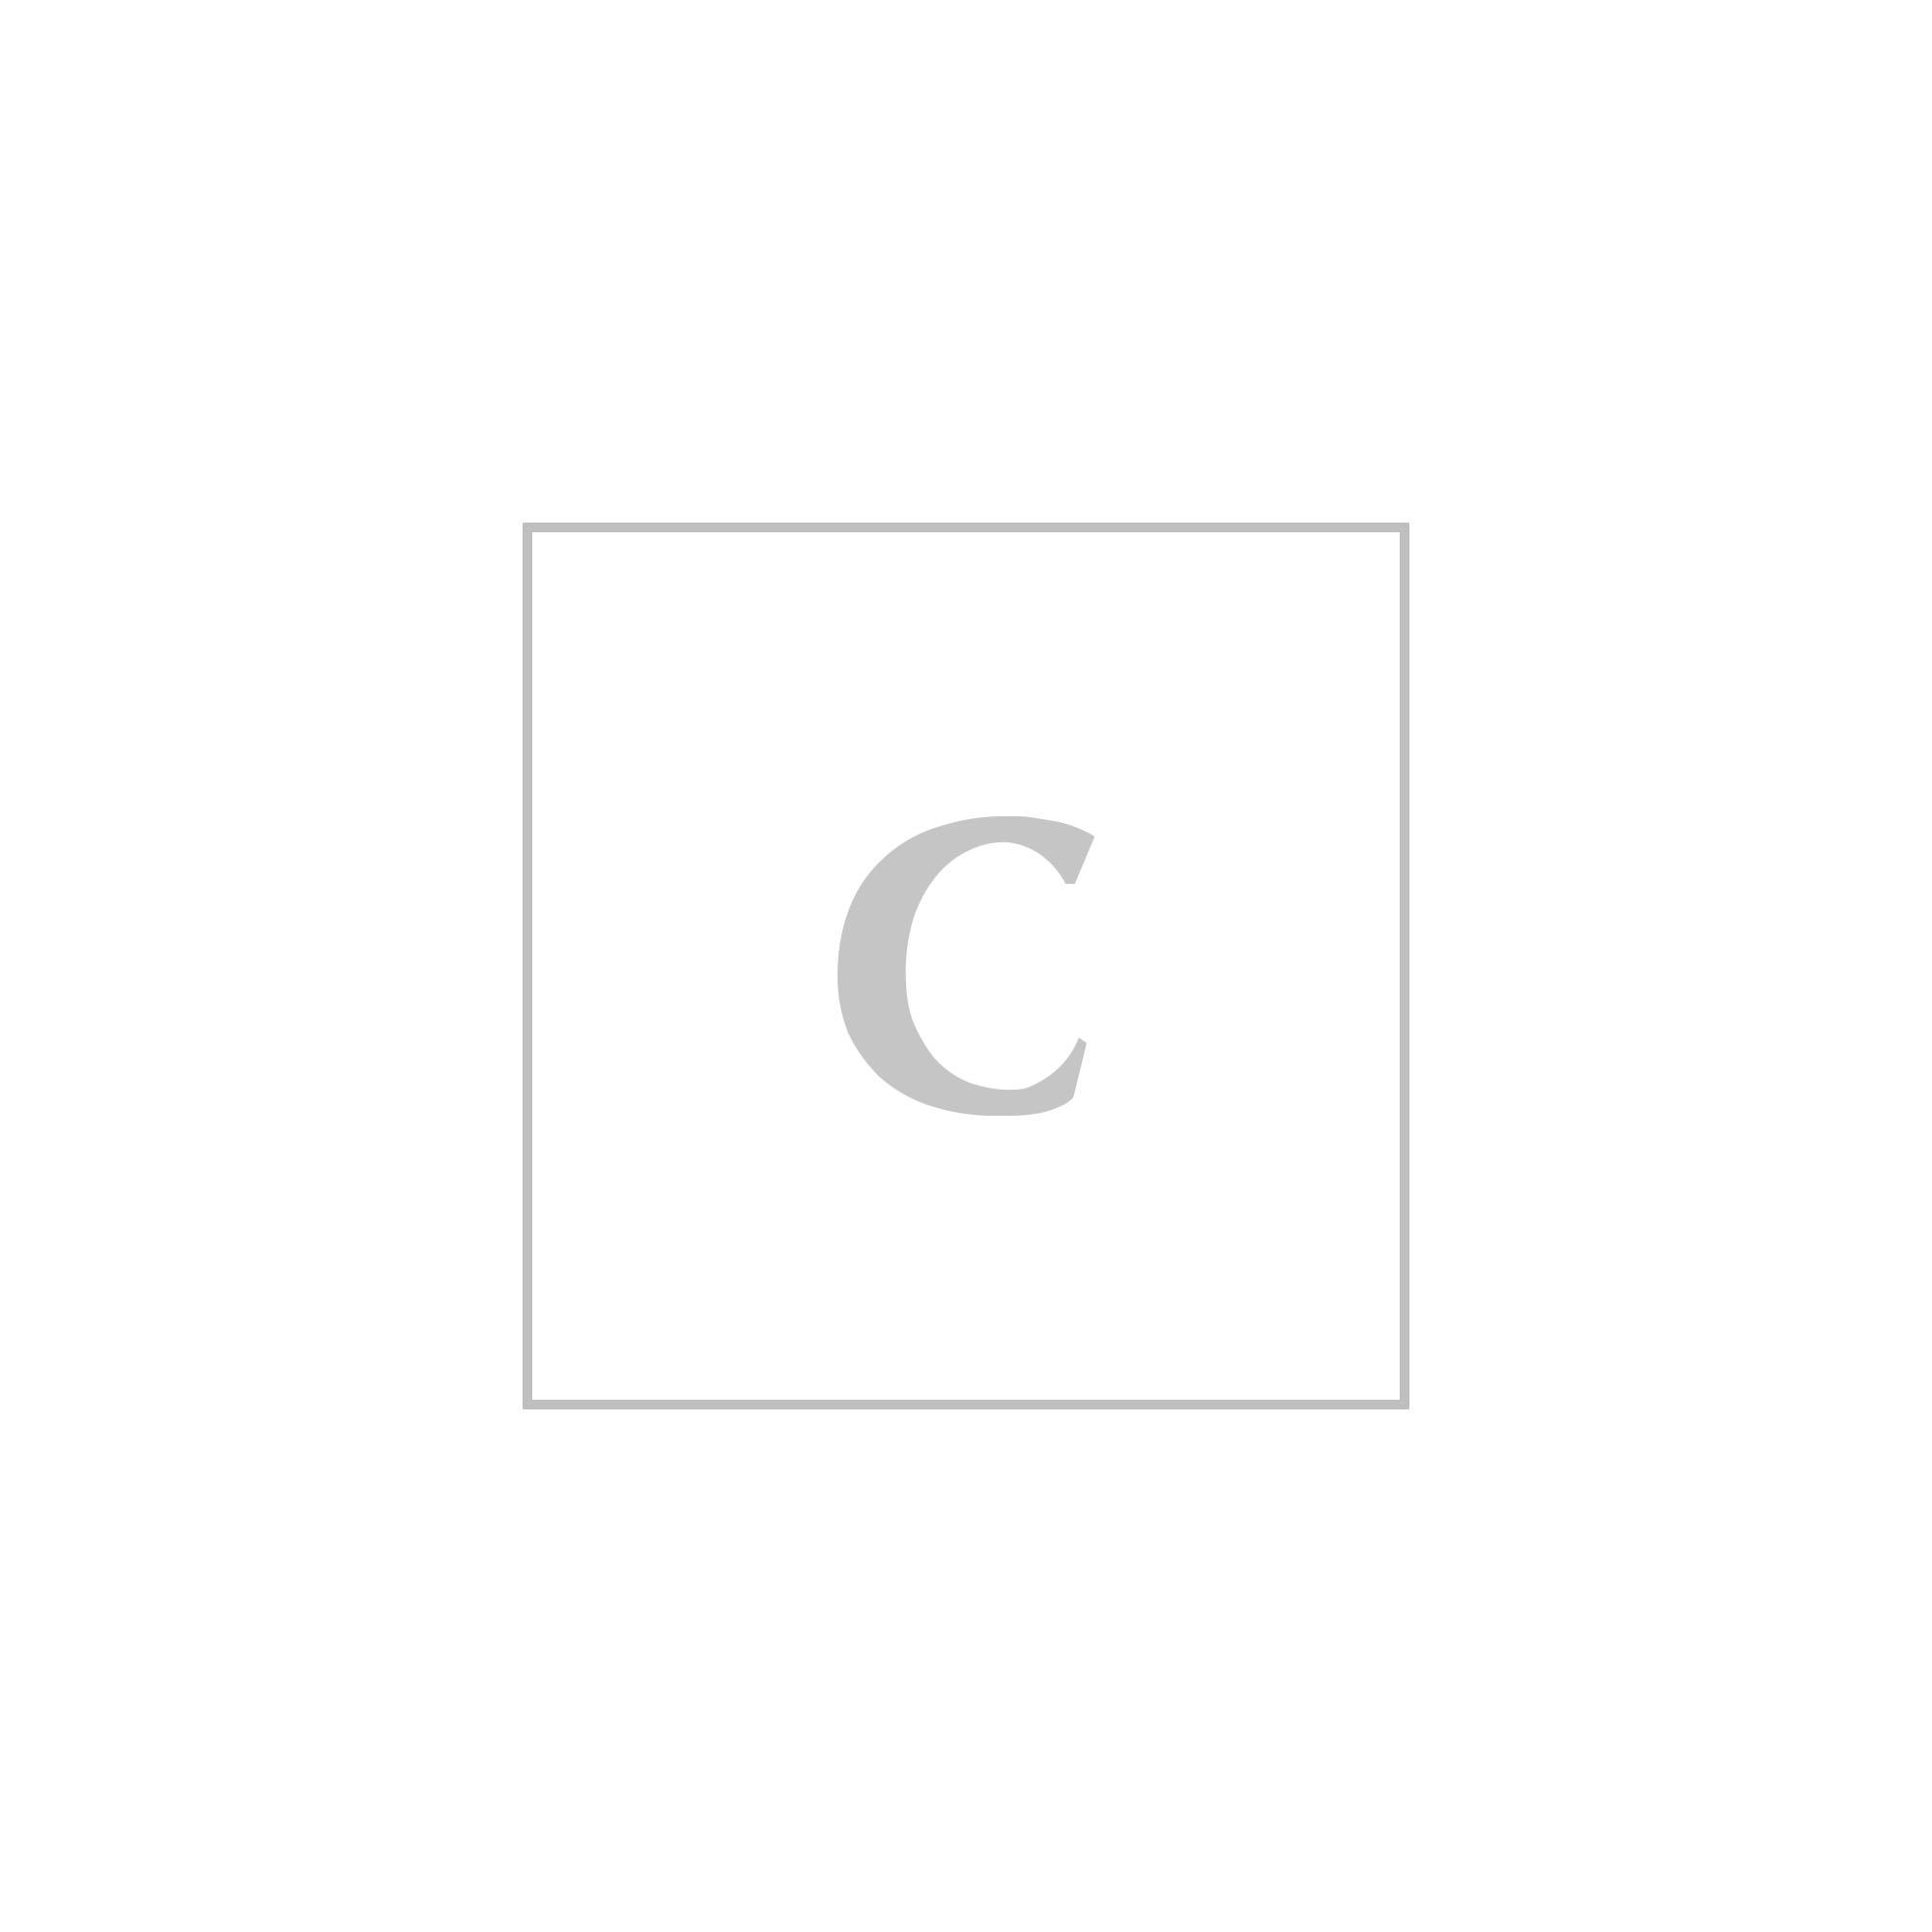 ysl cabas red - Men Saint Laurent Backpacks Noir/blanc | Coltorti Boutique